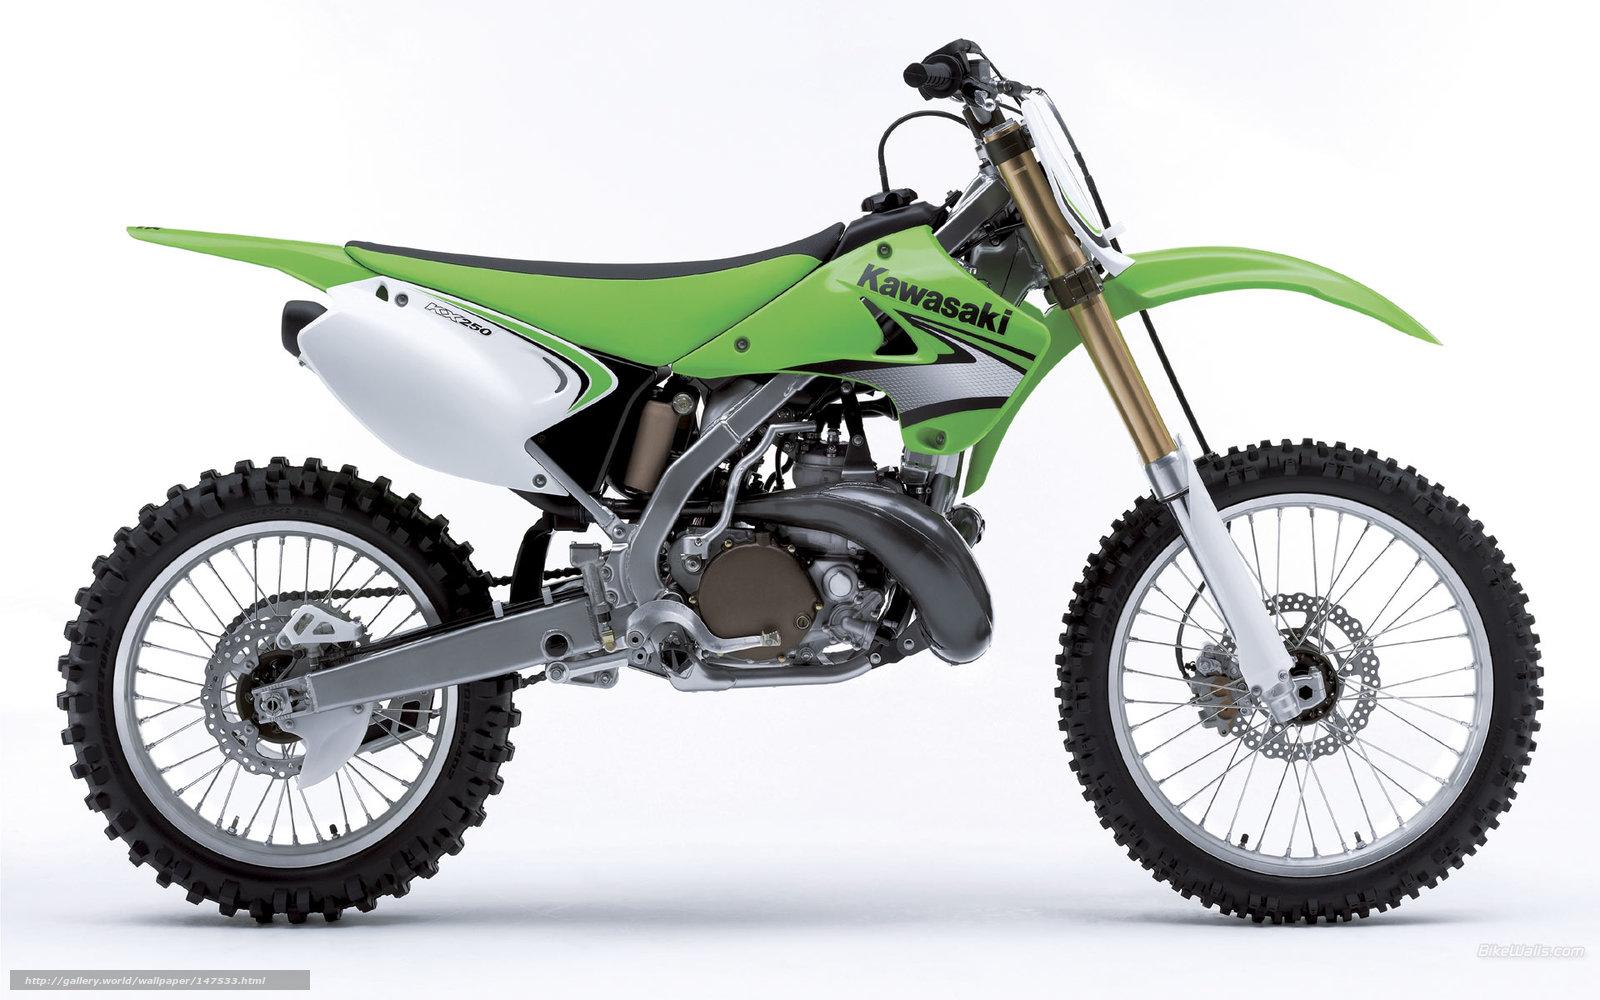 Мануалы и документация для Kawasaki KX 250 F (KX250F)